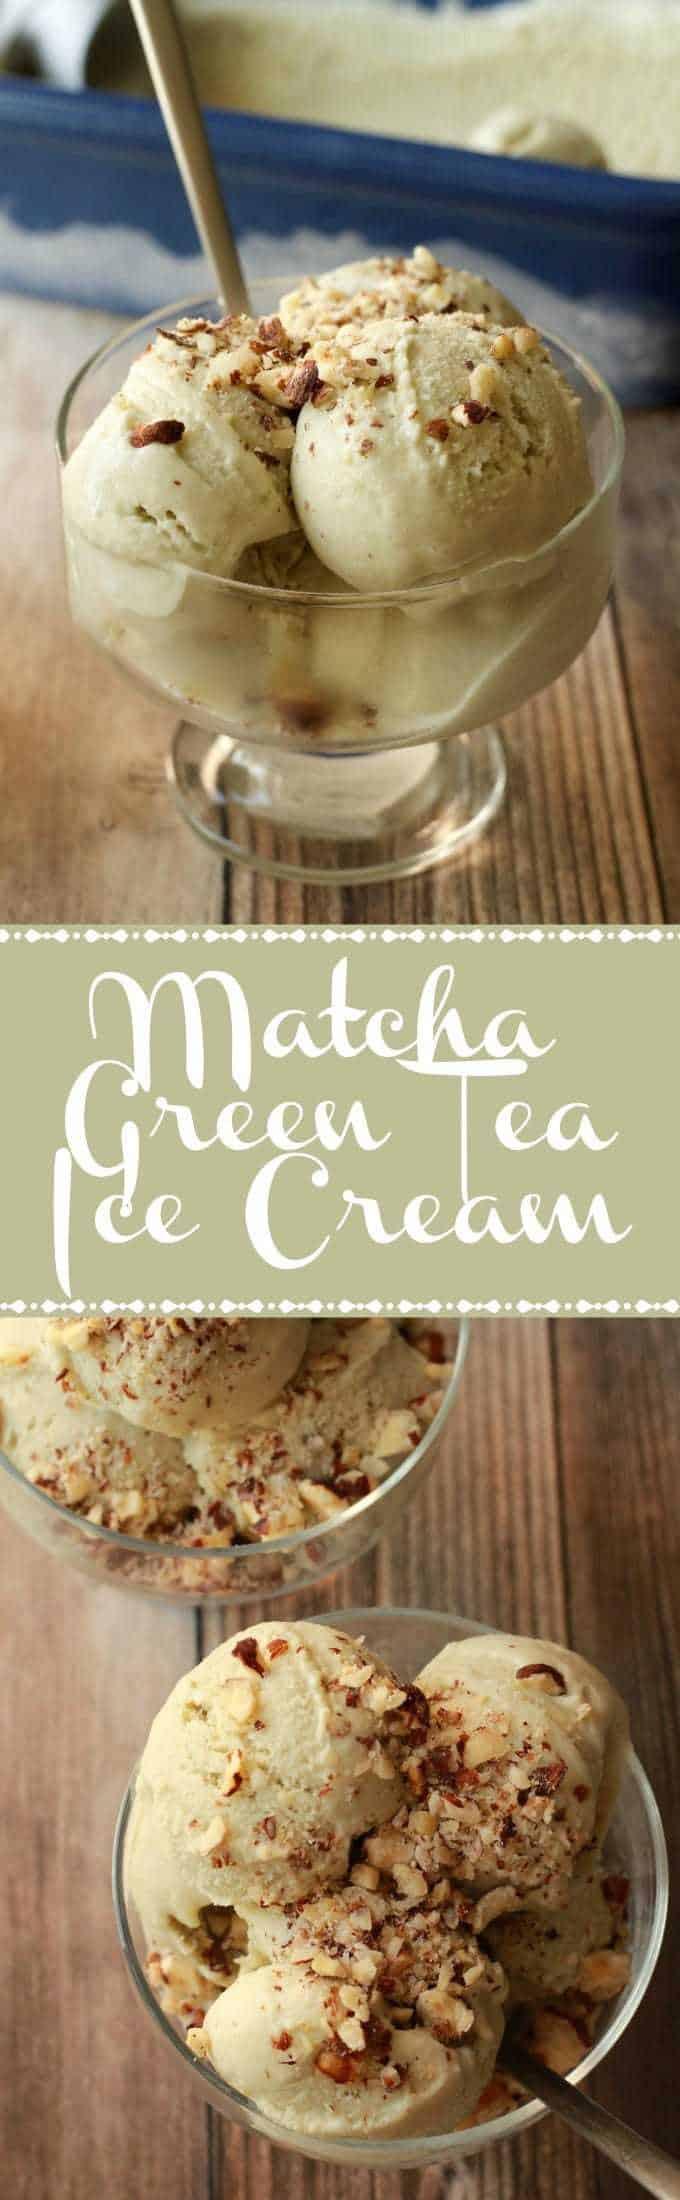 Ultra-creamy and smooth matcha green tea ice cream. Vegan and gluten-free this is really like the best textured vegan ice cream you've ever had! | lovingitvegan.com